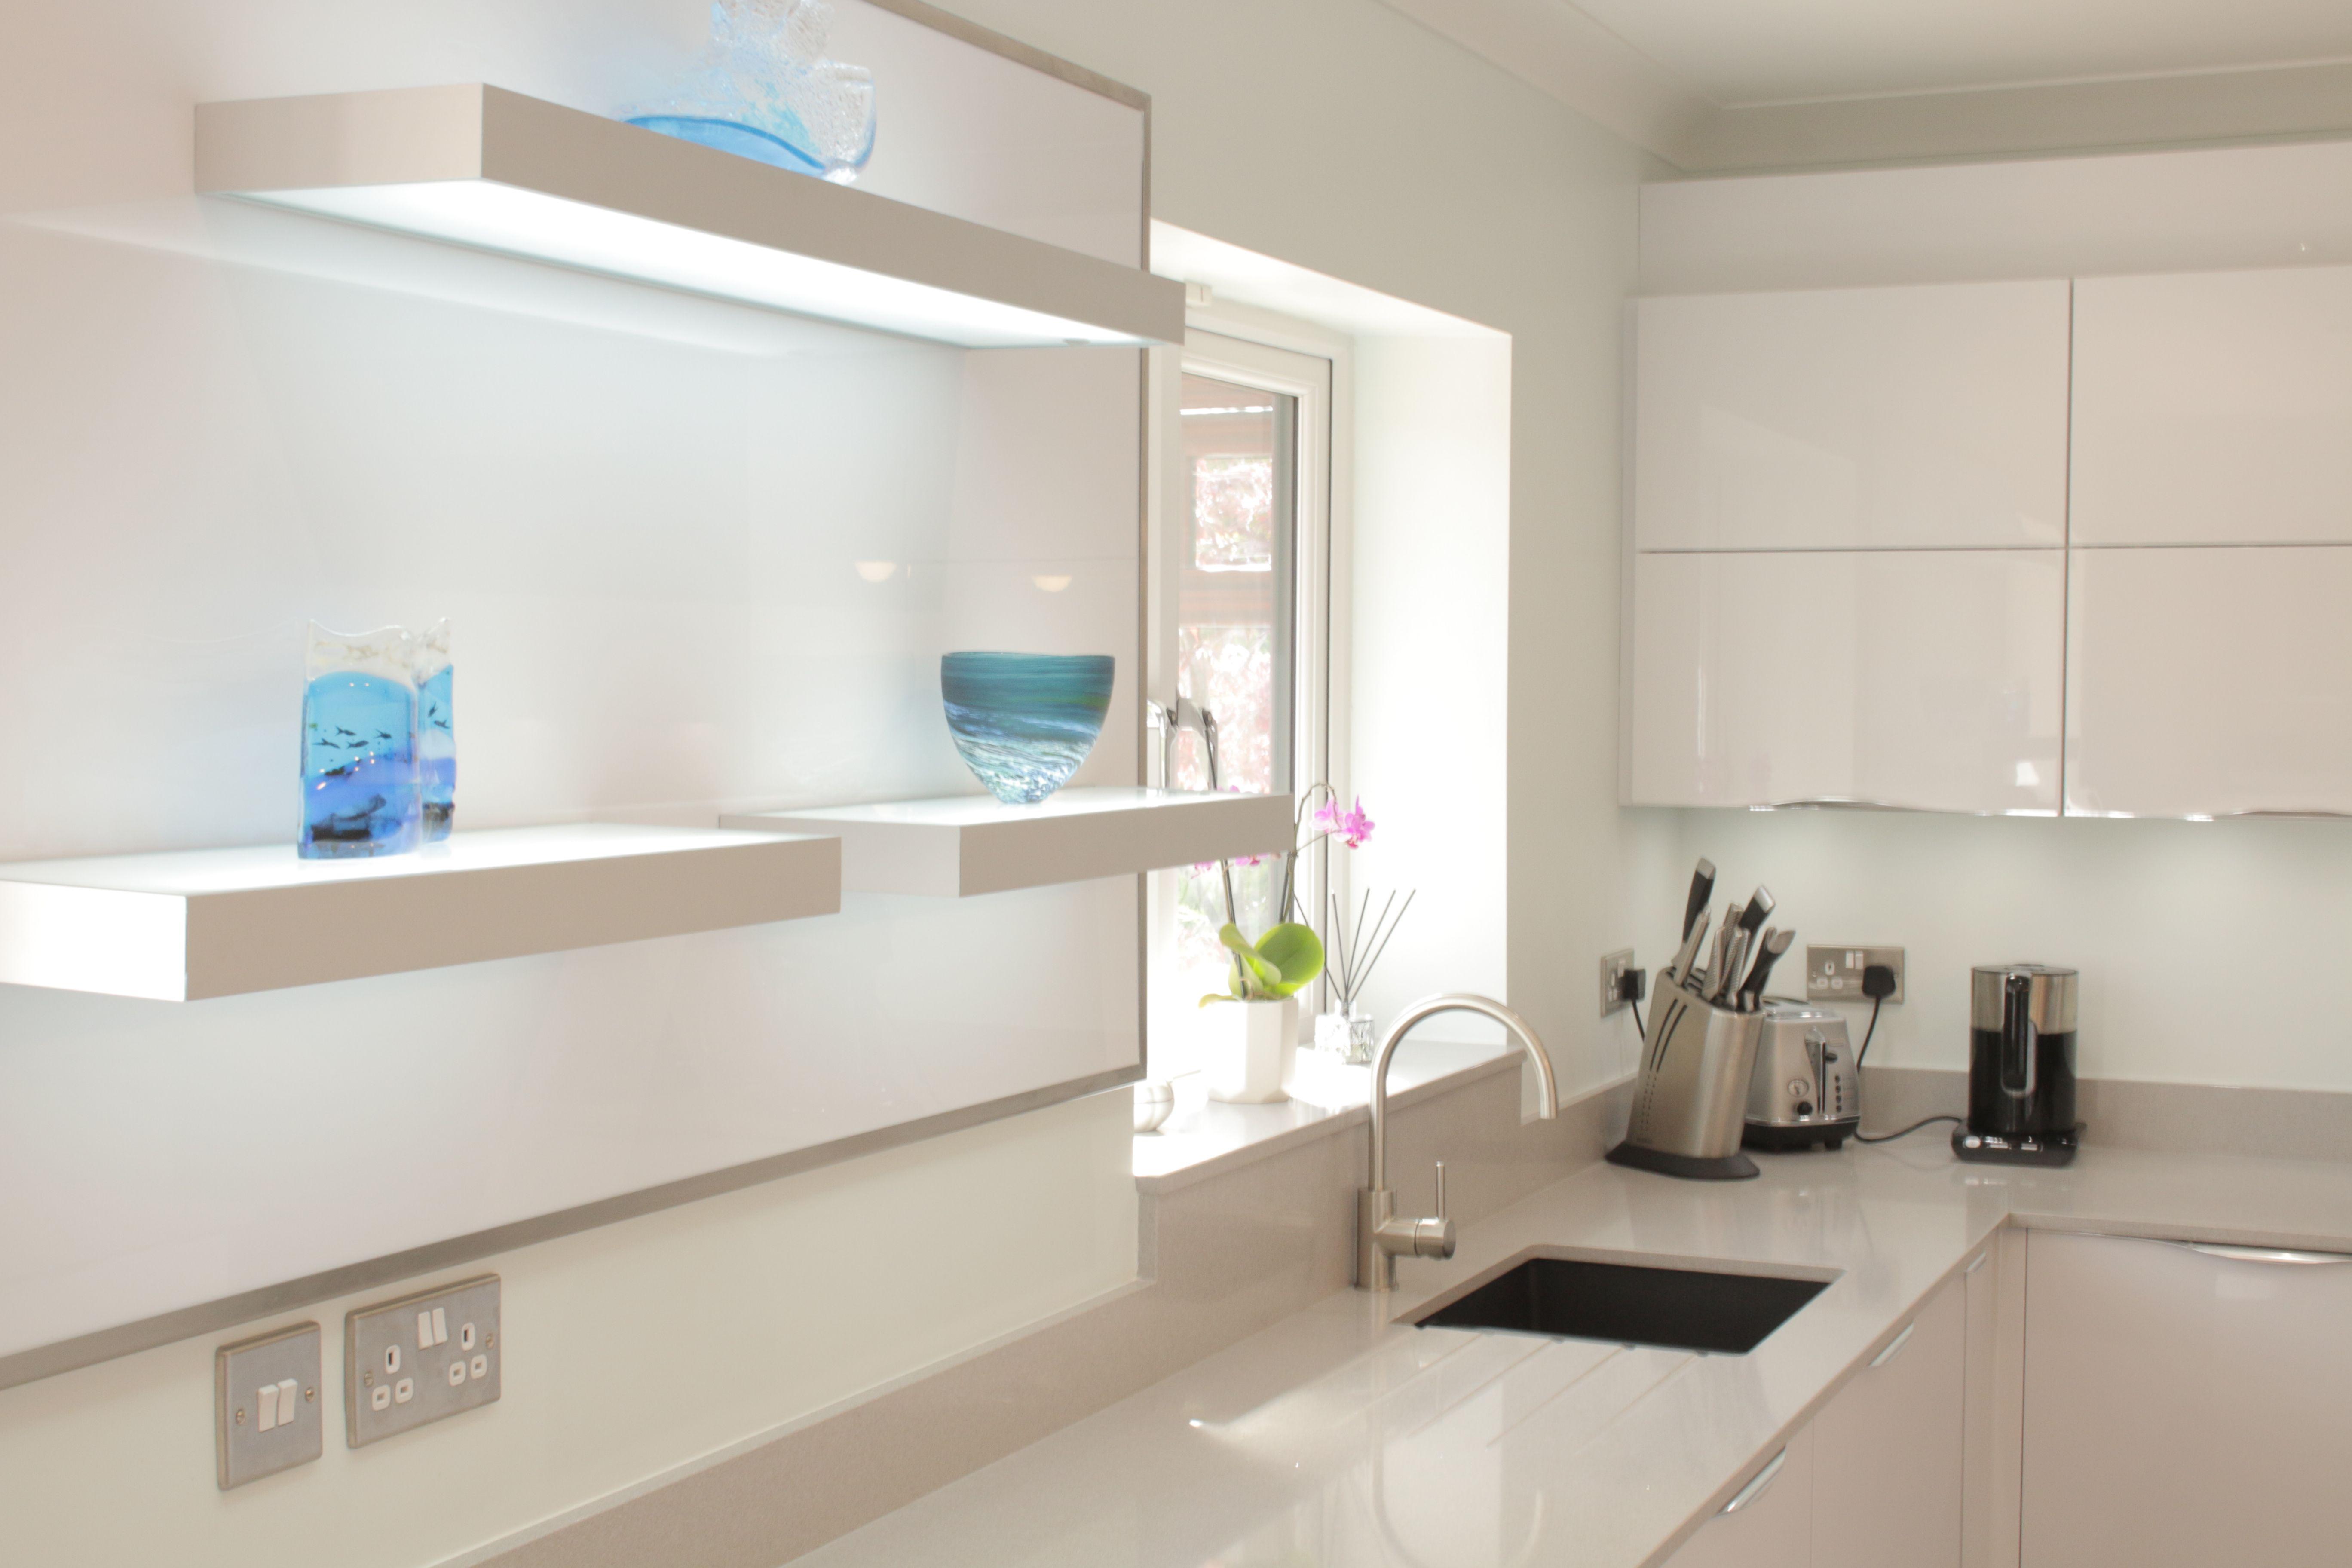 Lake View Kitchen Created By Simply Kitchens Plymouth. Modern Kitchen,  White Kitchen, Kitchen